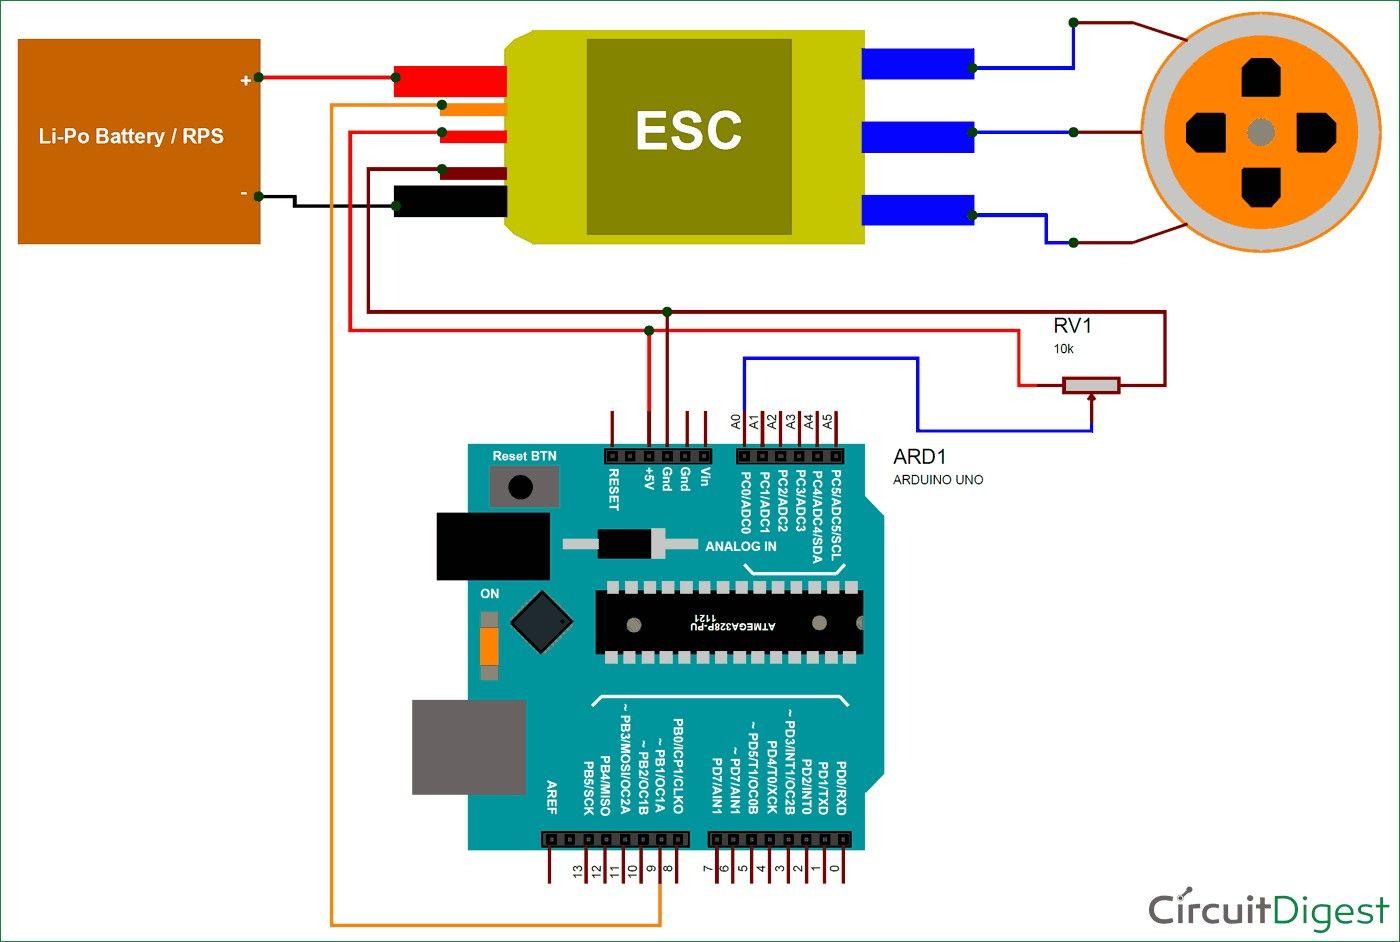 Circuit Diagram Maker Arduino Inspirational Circuit Diagram For Controlling Brushless Dc Motor Using In 2020 Arduino Electrical Circuit Diagram Circuit Diagram